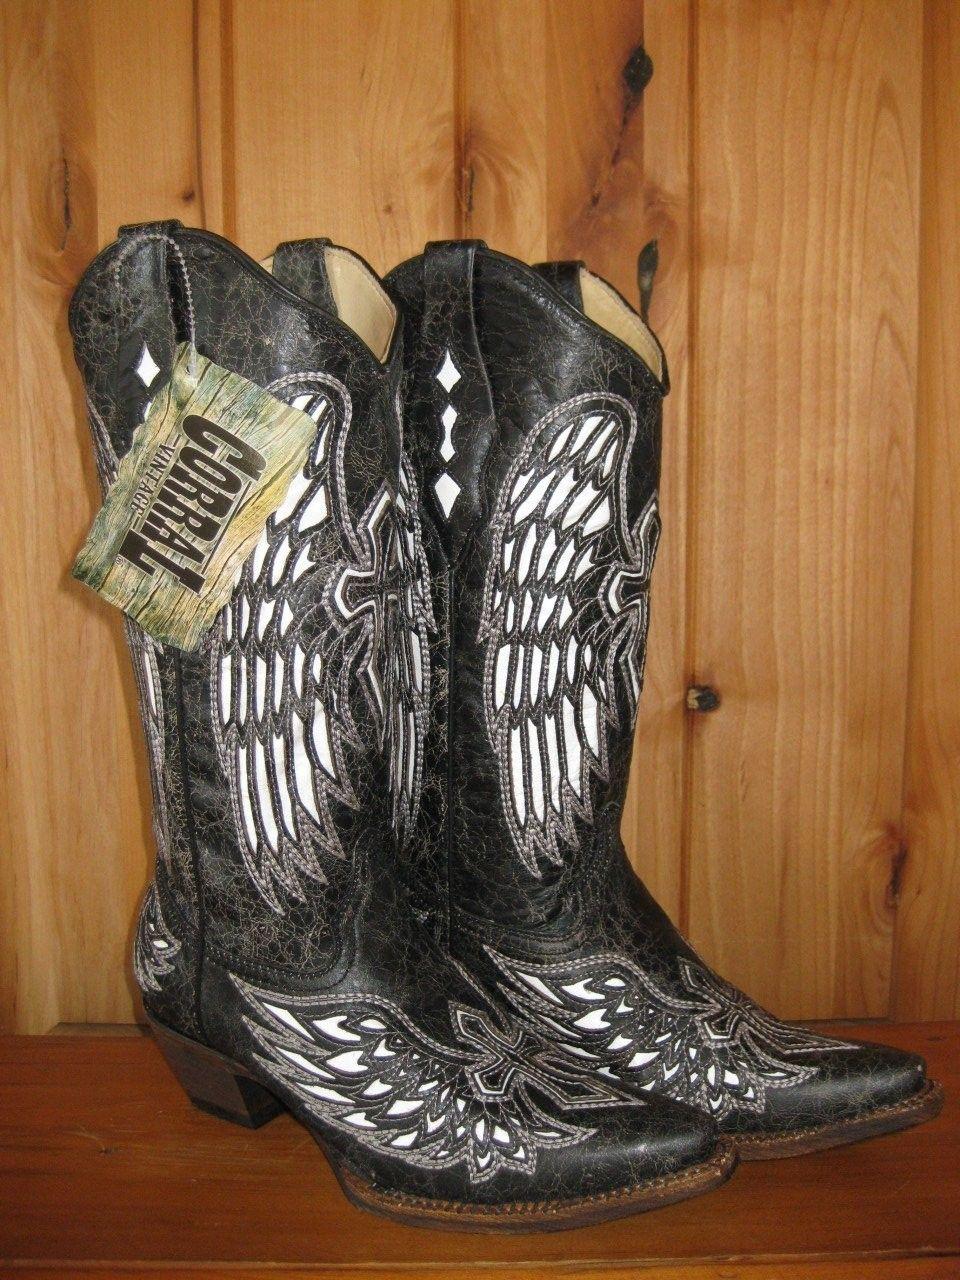 Corral Ladies Snip Toe Western Cowboy Boots Black Bone White Wing /& Cross A1018